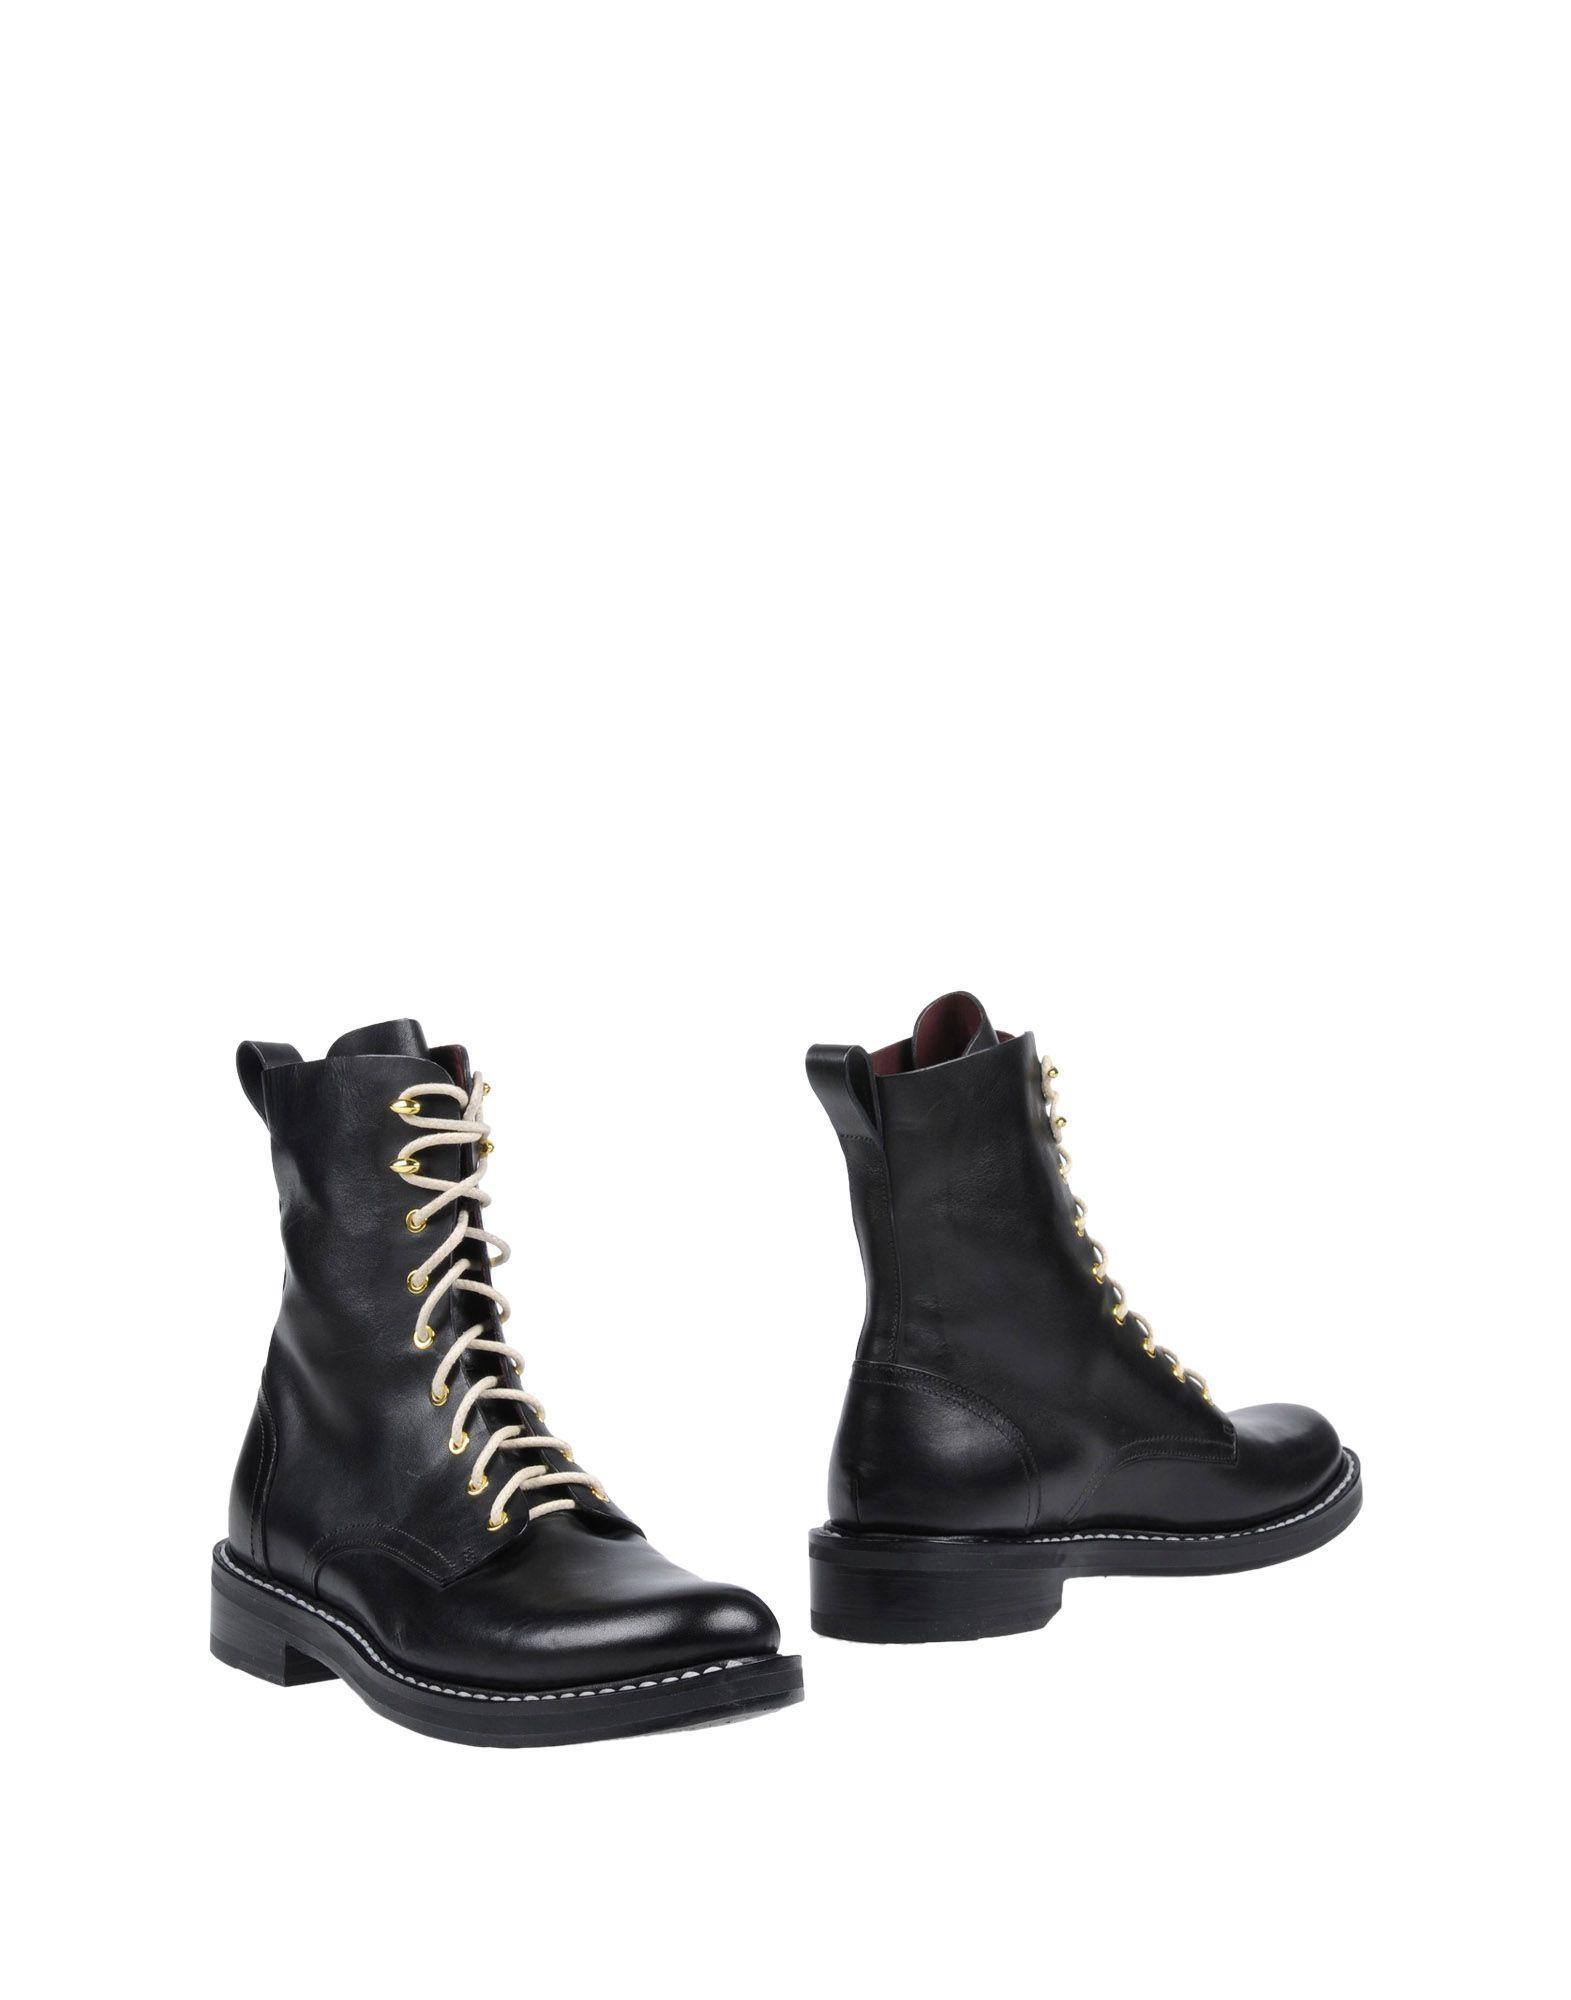 Rag & Bone Ankle Boots In Black